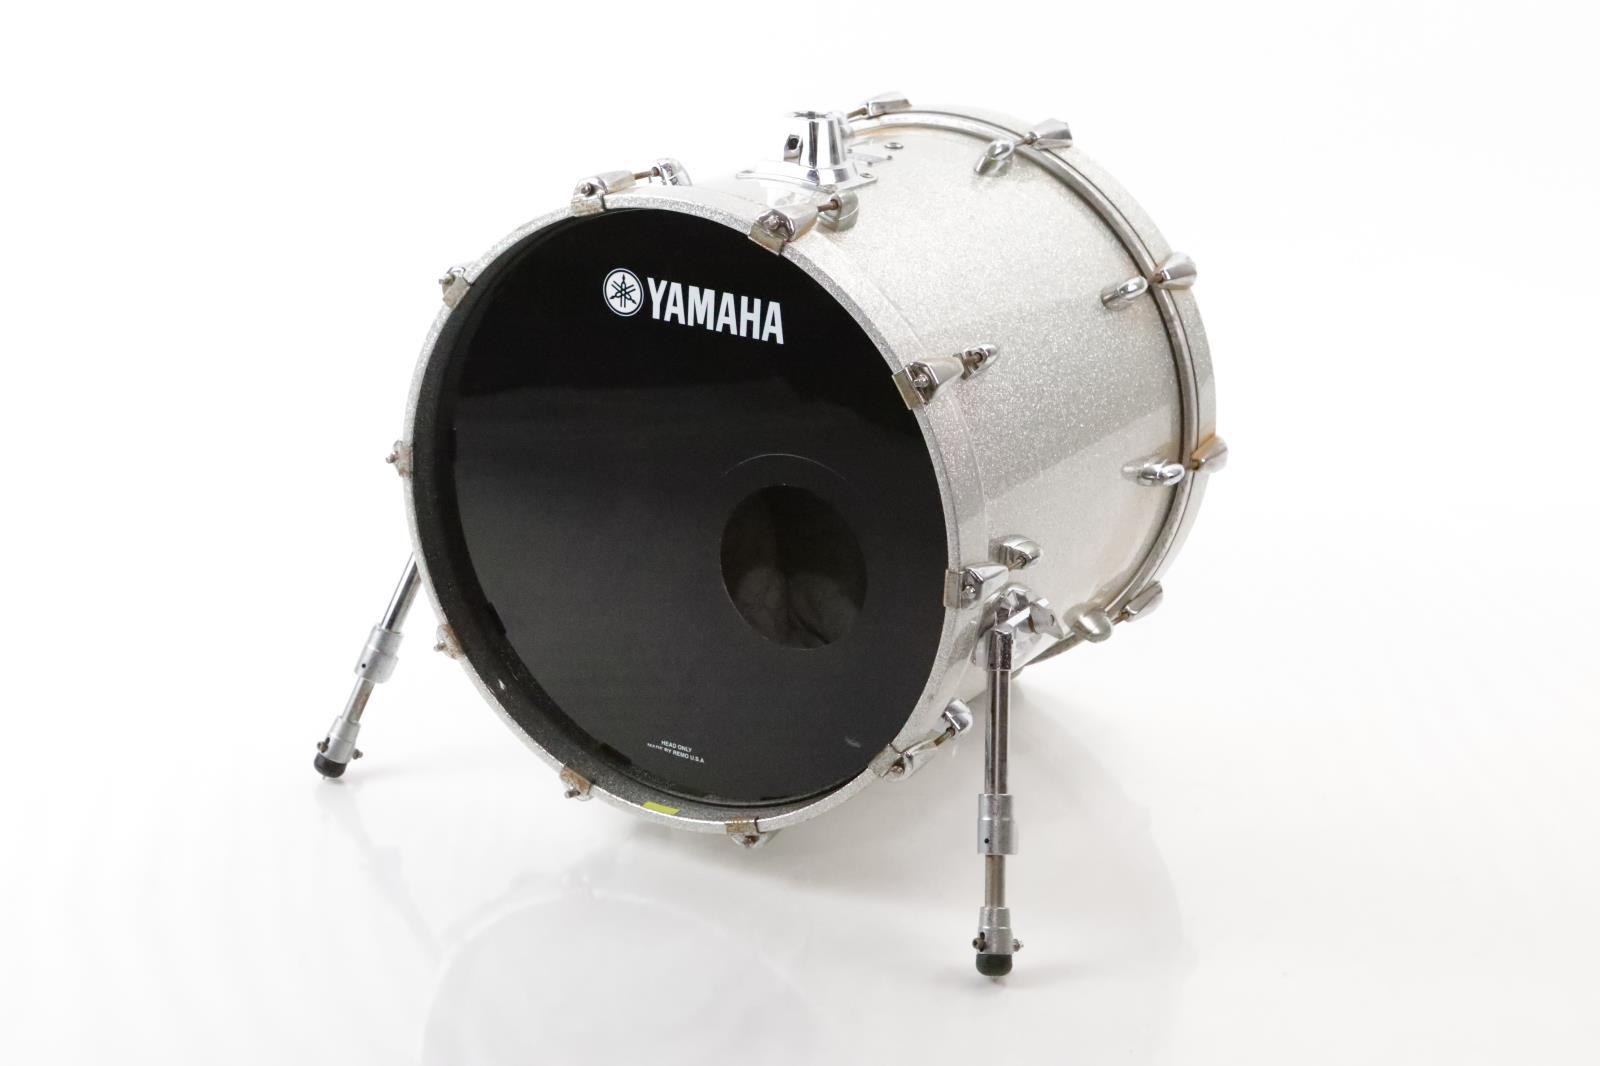 Yamaha 20x18 Oak Custom Kick Bass Drum MIJ Japan Silver Sparkle #35011